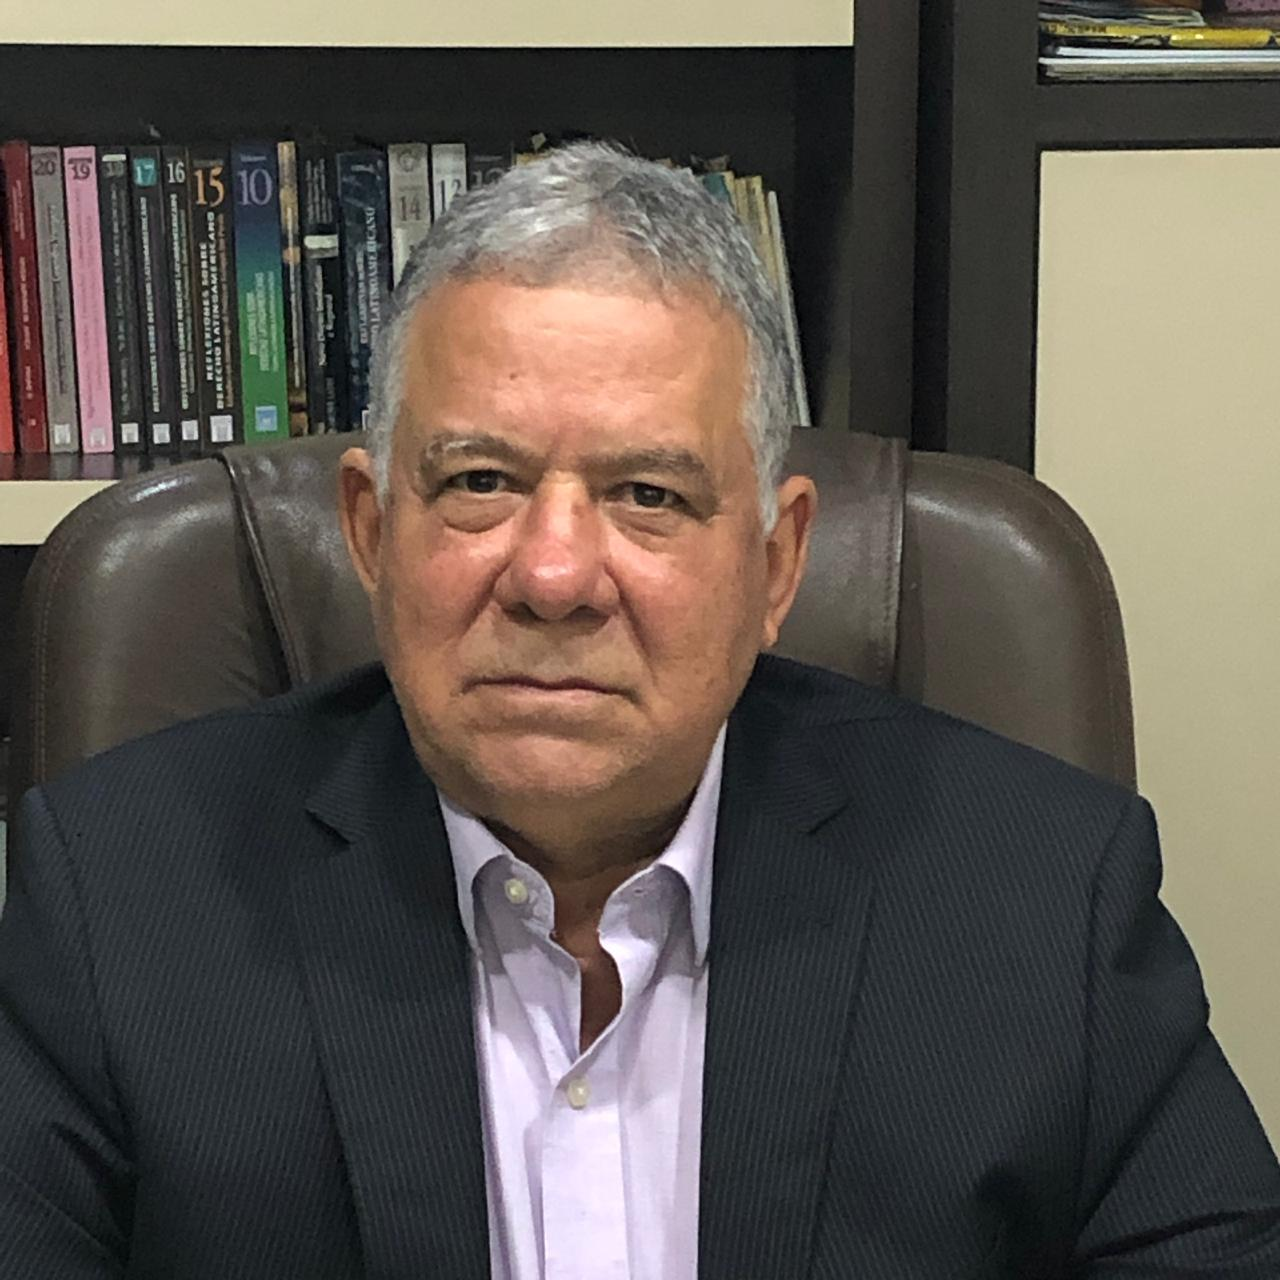 José Arimatéia AnoregMT